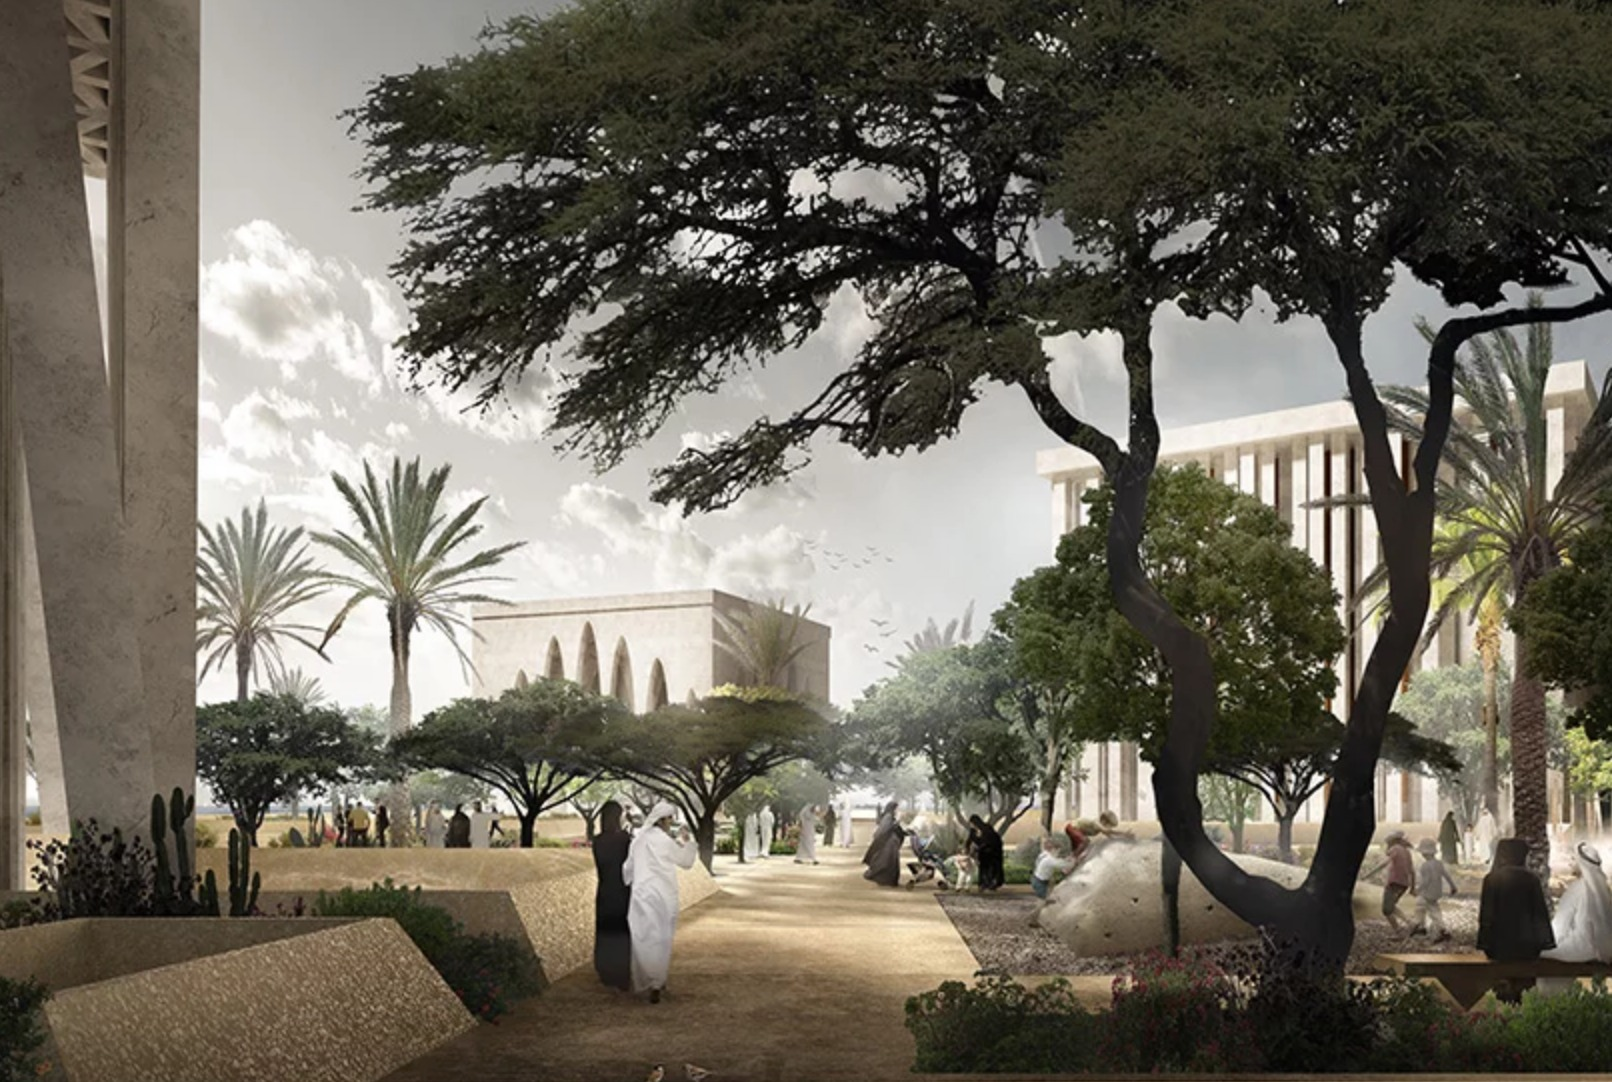 Abu Dhabi: Igreja, mesquita e sinagoga no mesmo local